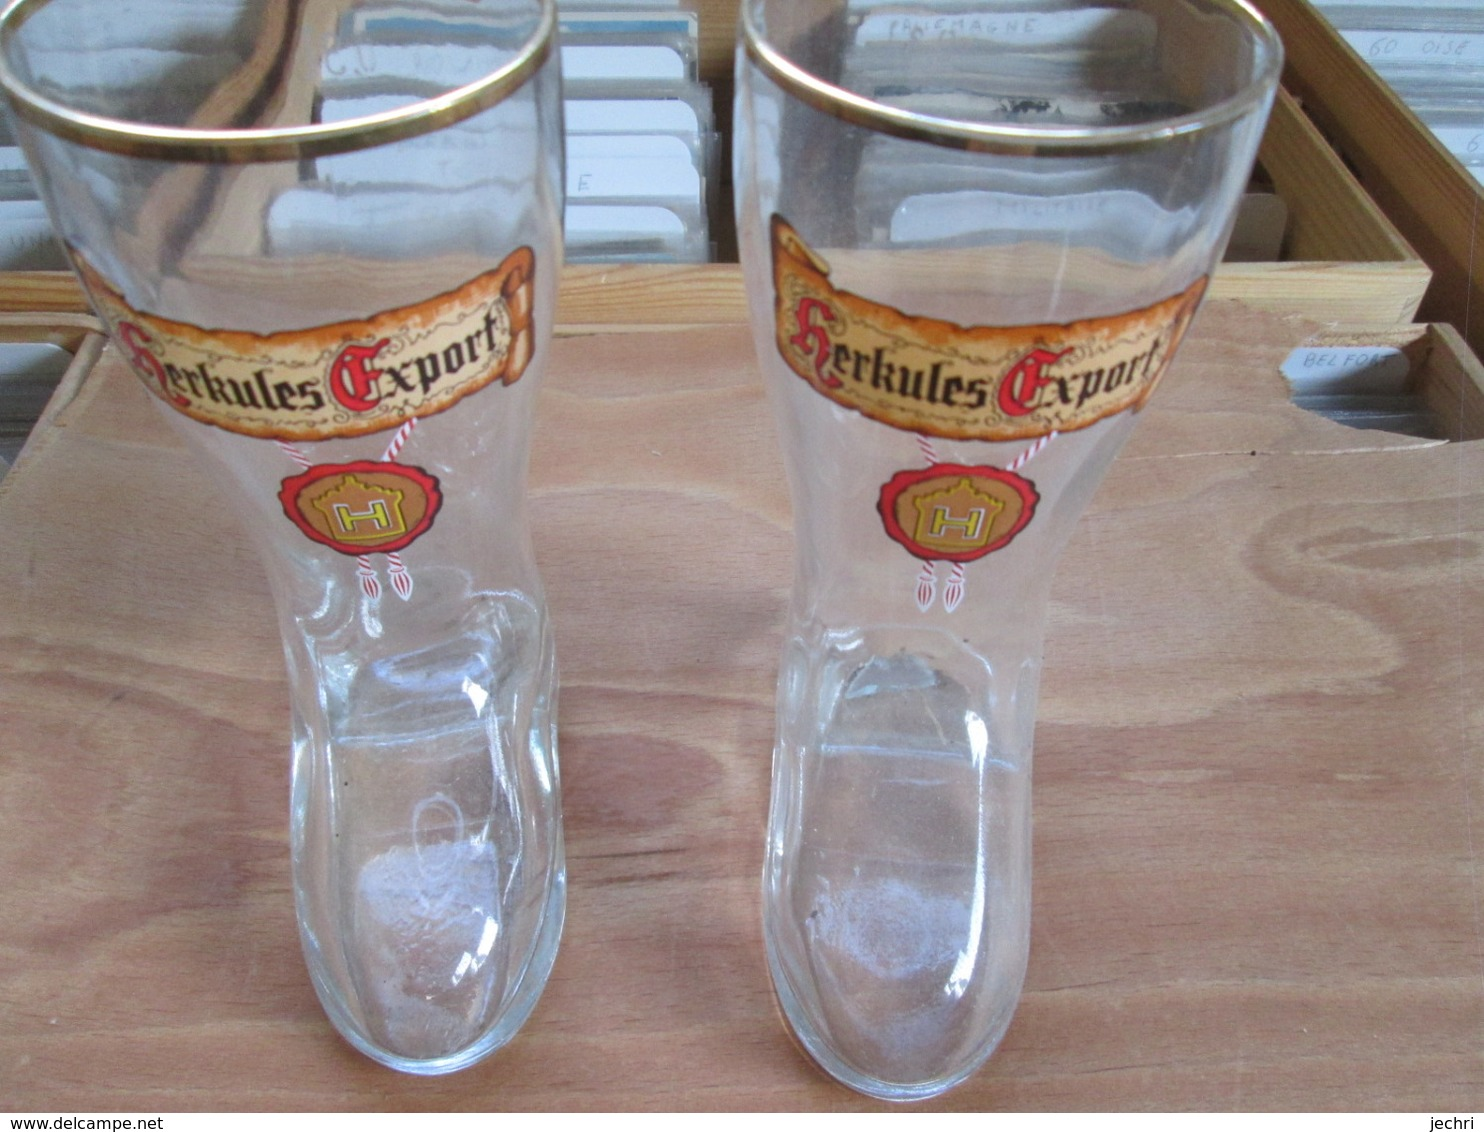 2 Verres Style Bottes . Herkules Export - Gläser